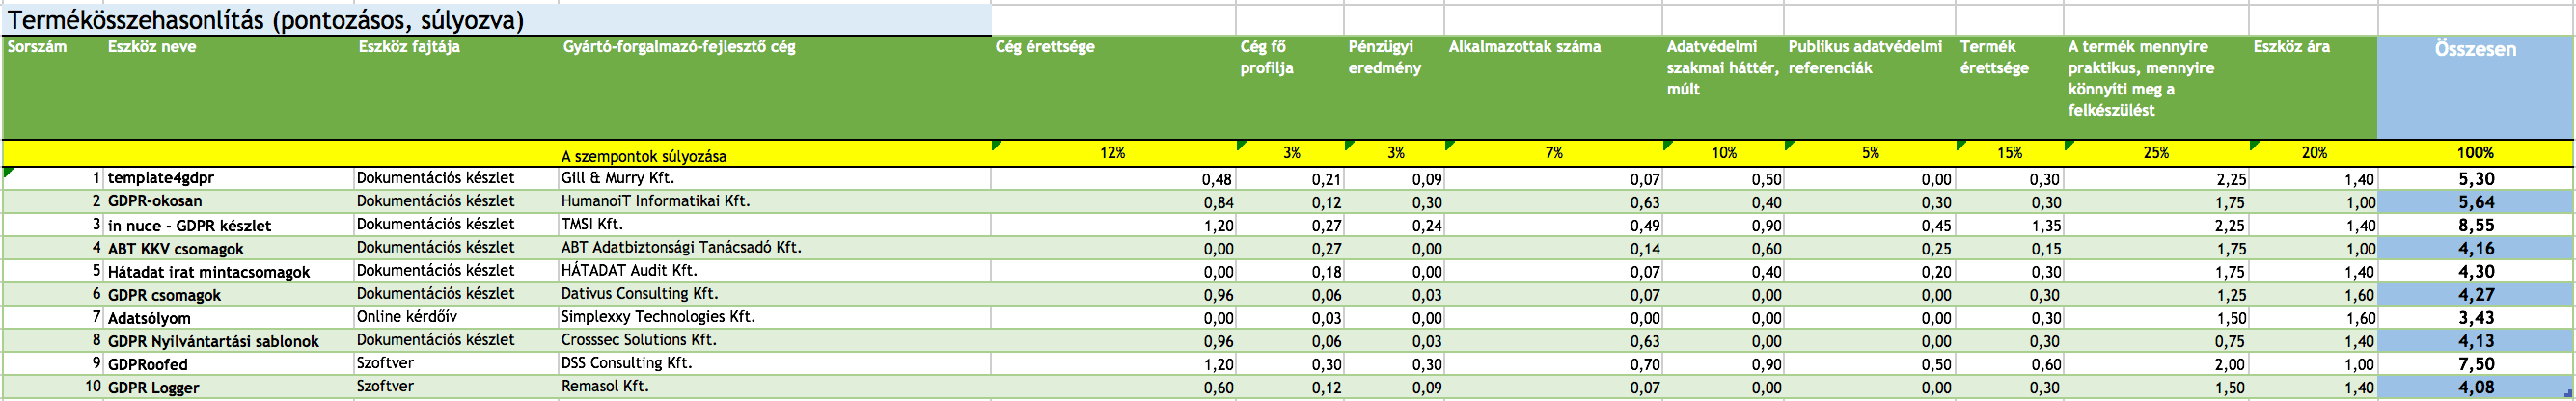 gdpr eszközök adatsor